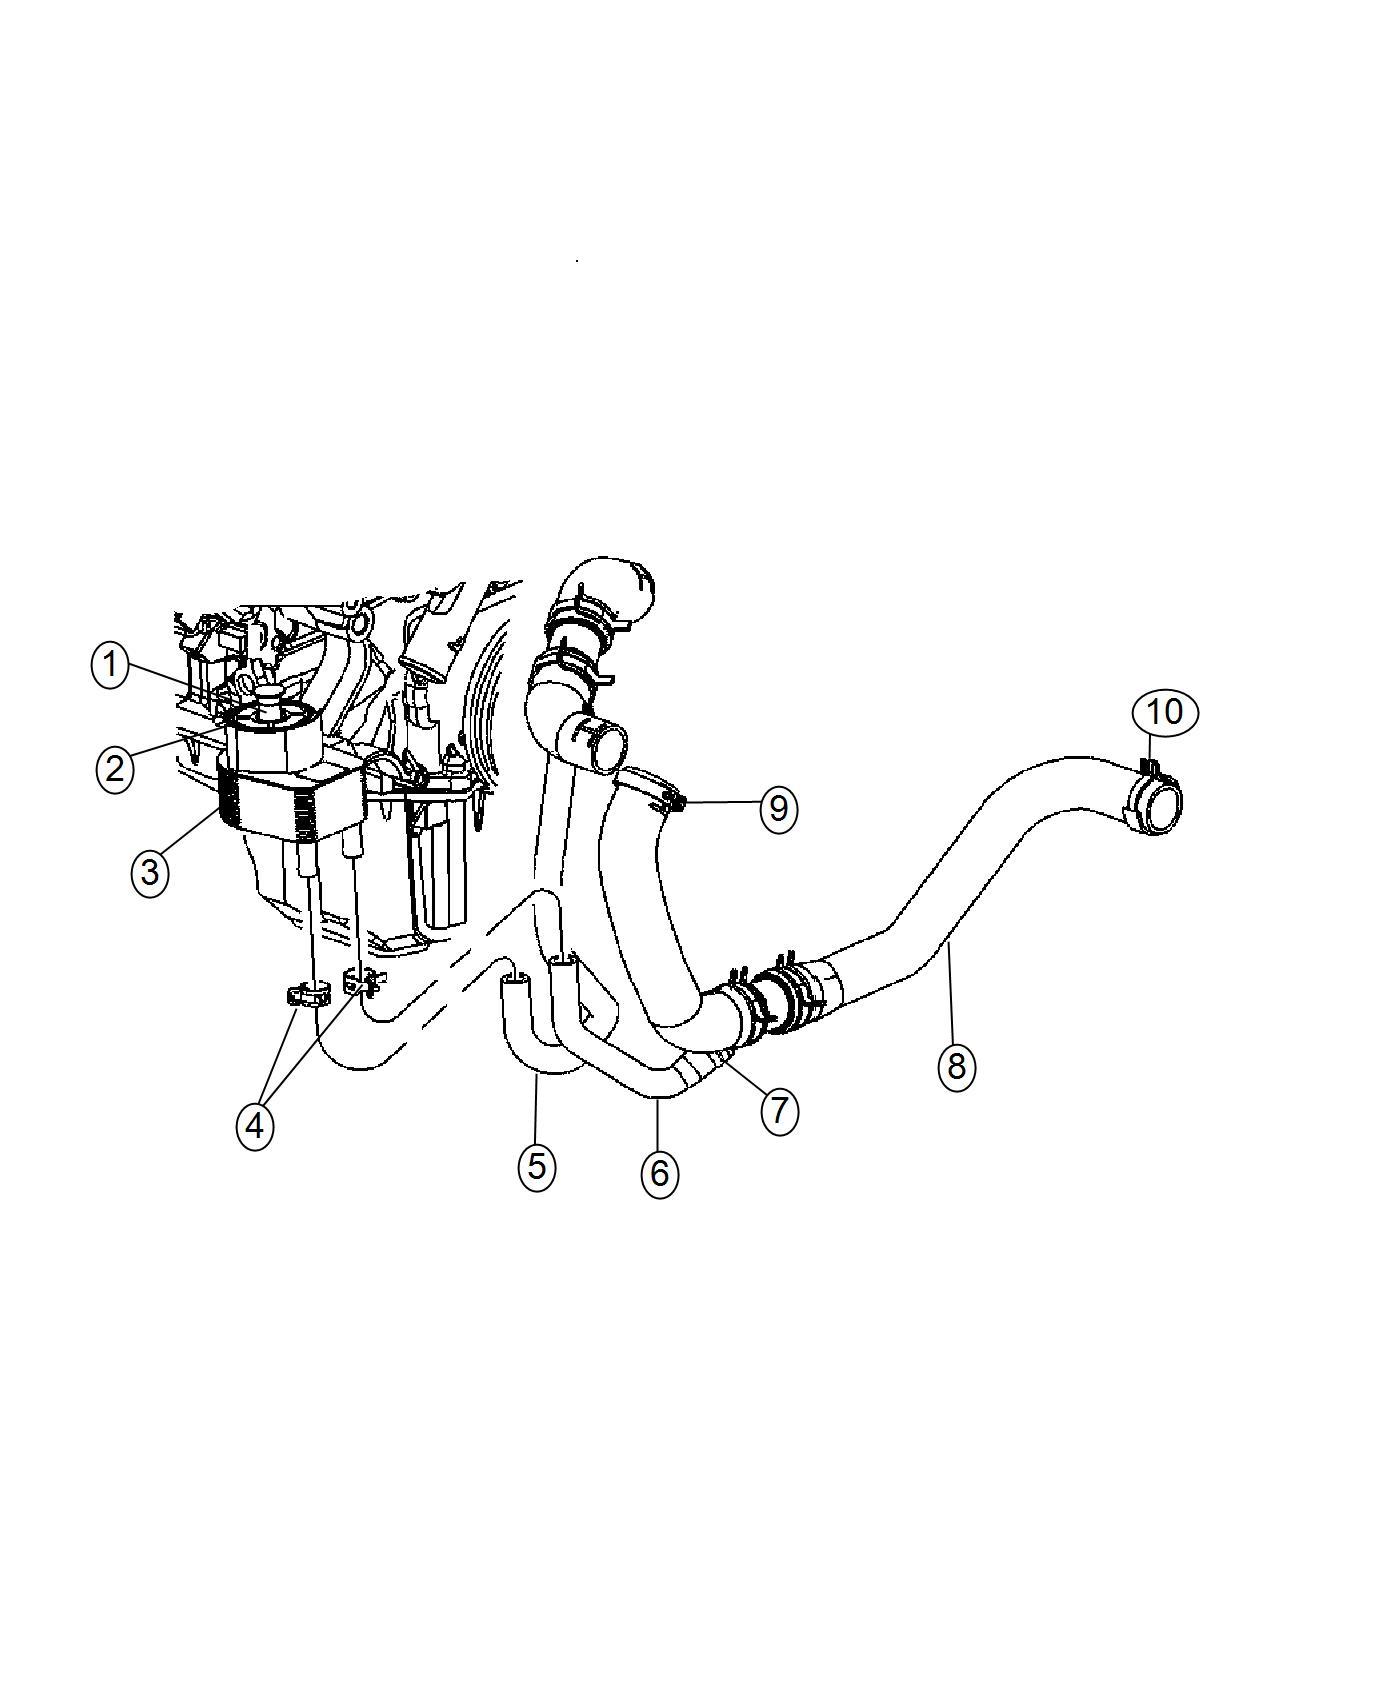 2016 Dodge Charger Hose. Engine coolant to oil cooler